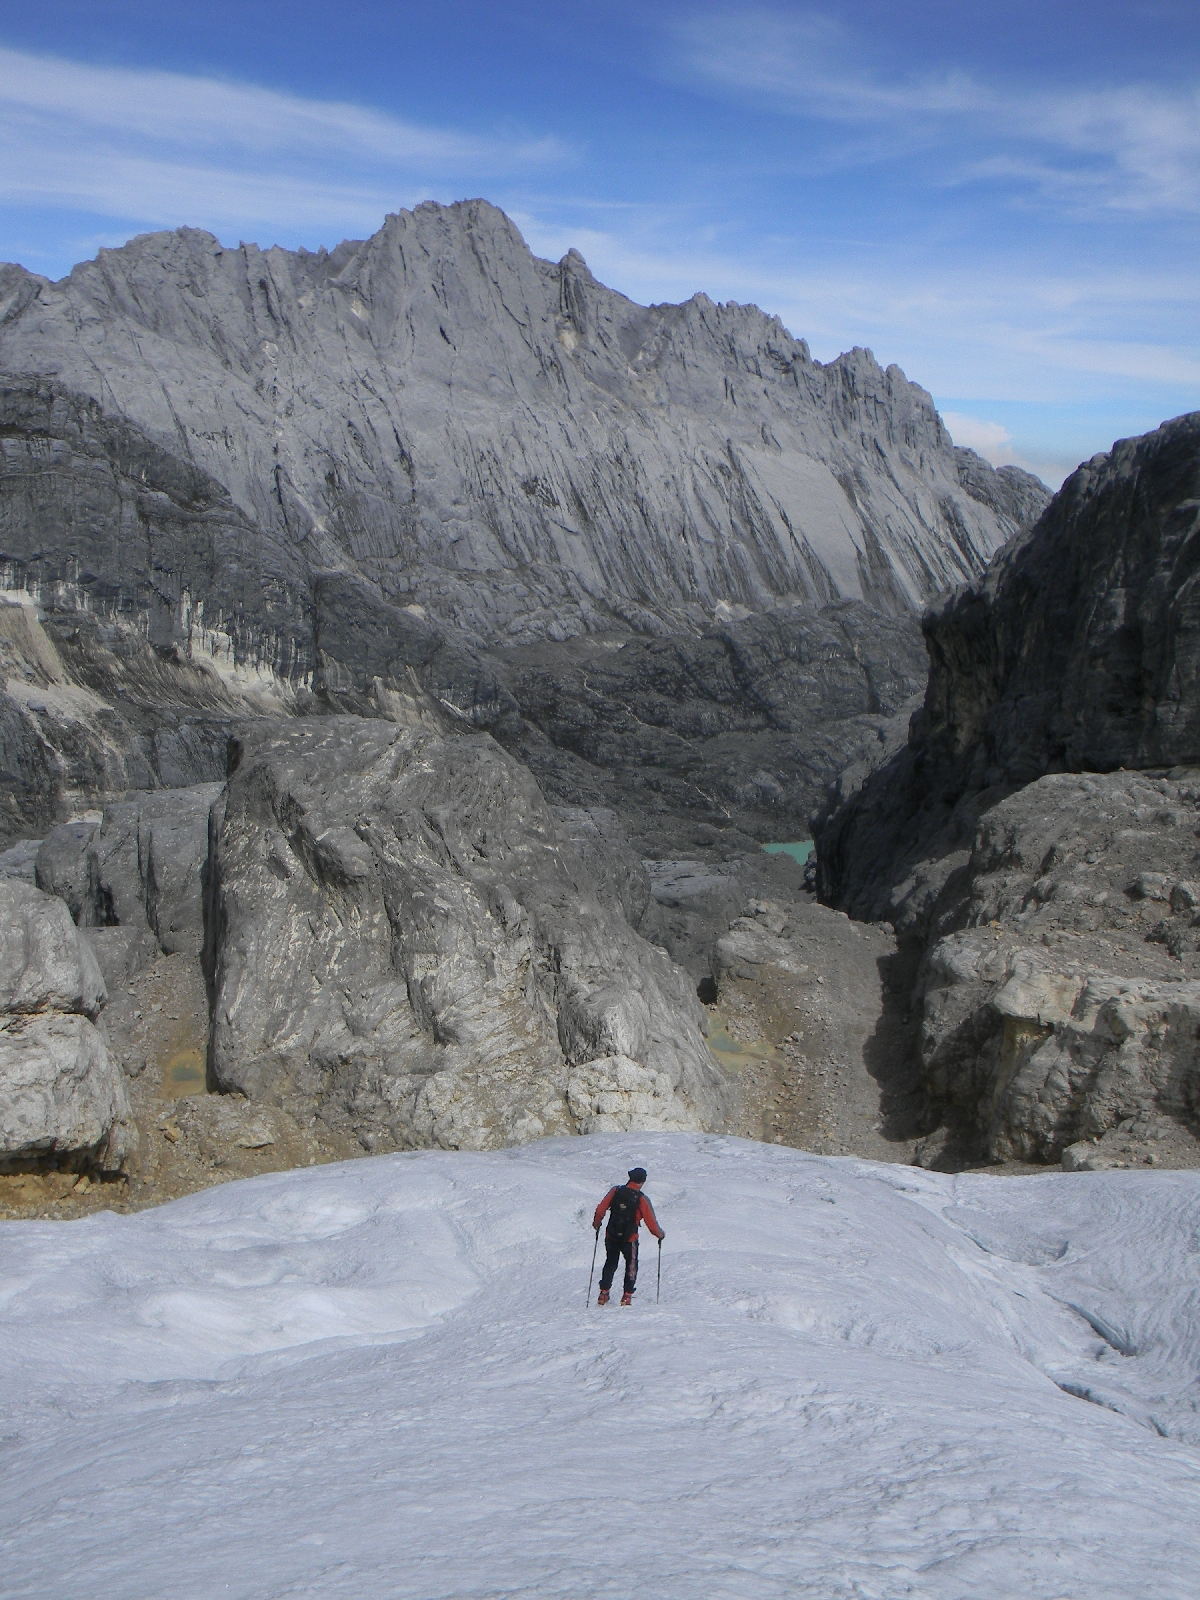 Carstensz Pyramid from North Wall Firn (Robert Cassady, 2010)